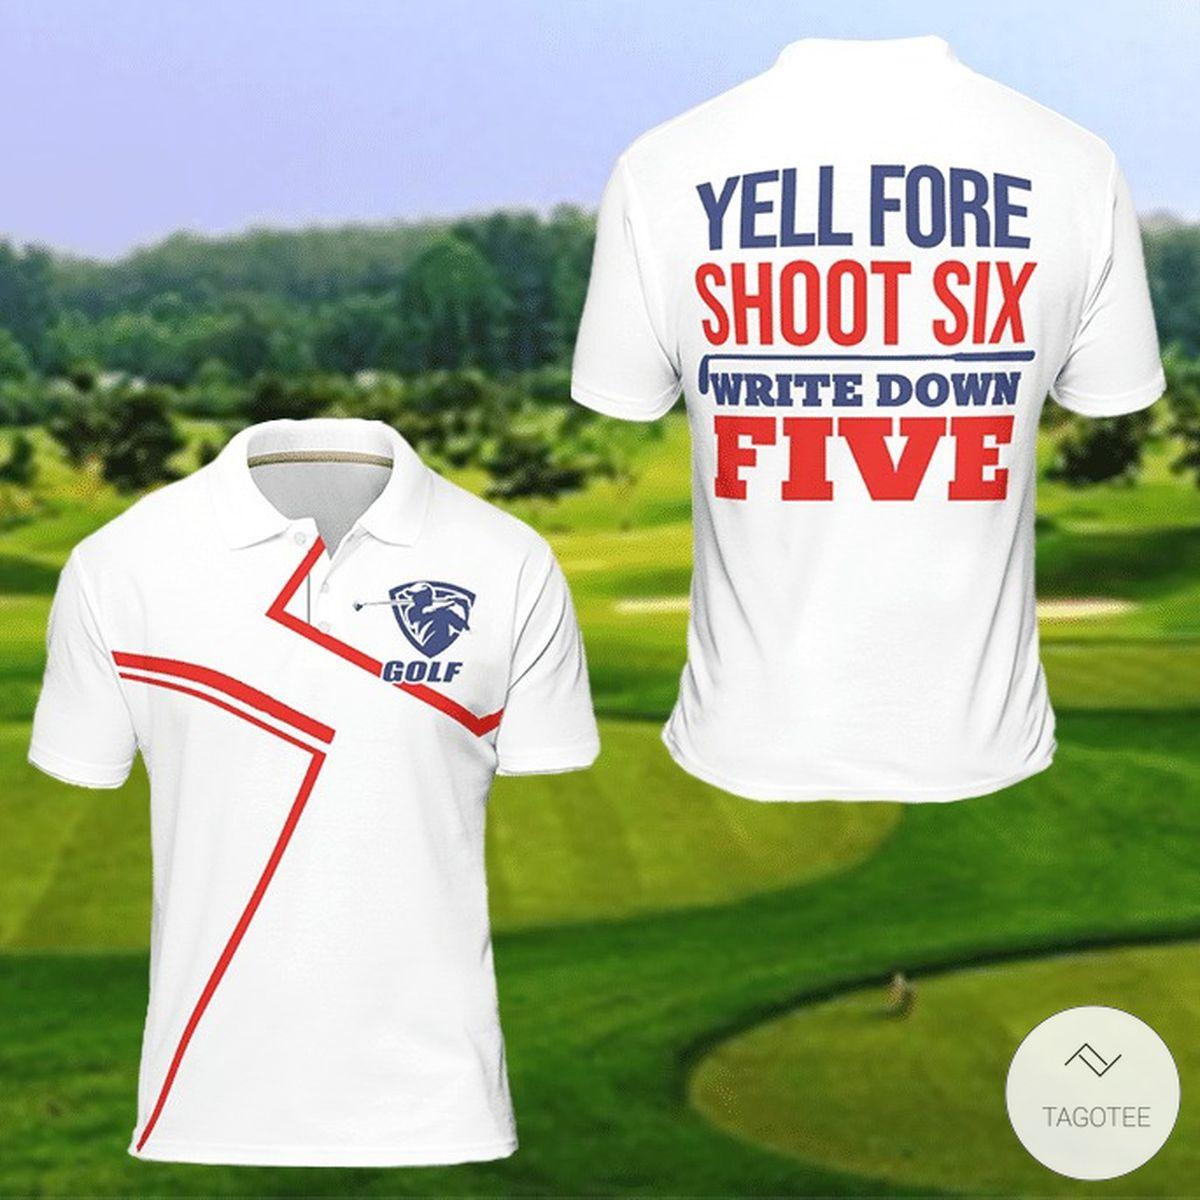 Yell Fore Shoot Six Write Down Five Golf Polo Shirt